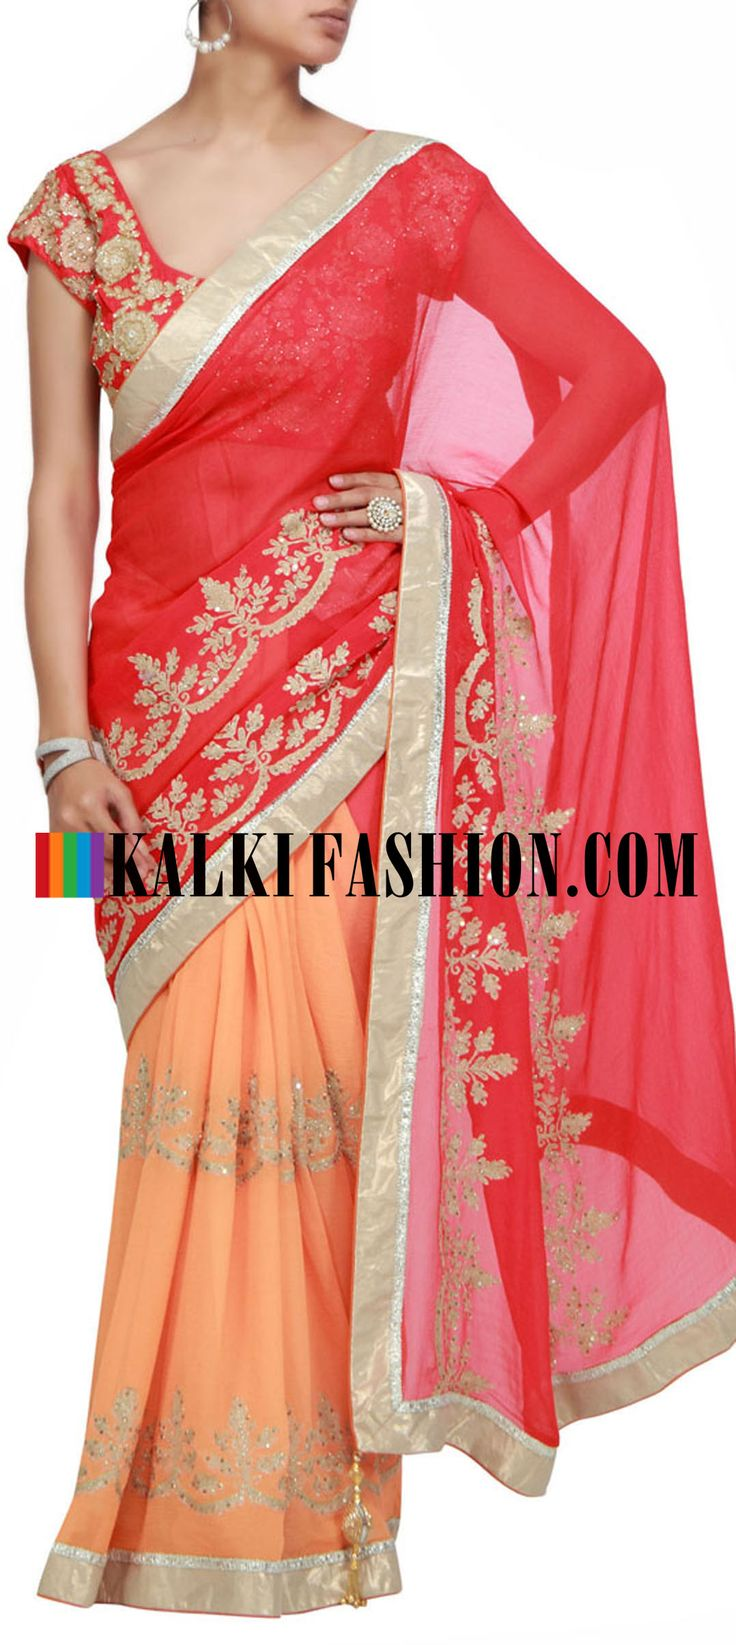 Buy it now  http://www.kalkifashion.com/half-and-half-saree-in-orange-and-chiffon-with-thread-work.html  Half and half saree in orange and chiffon with thread work